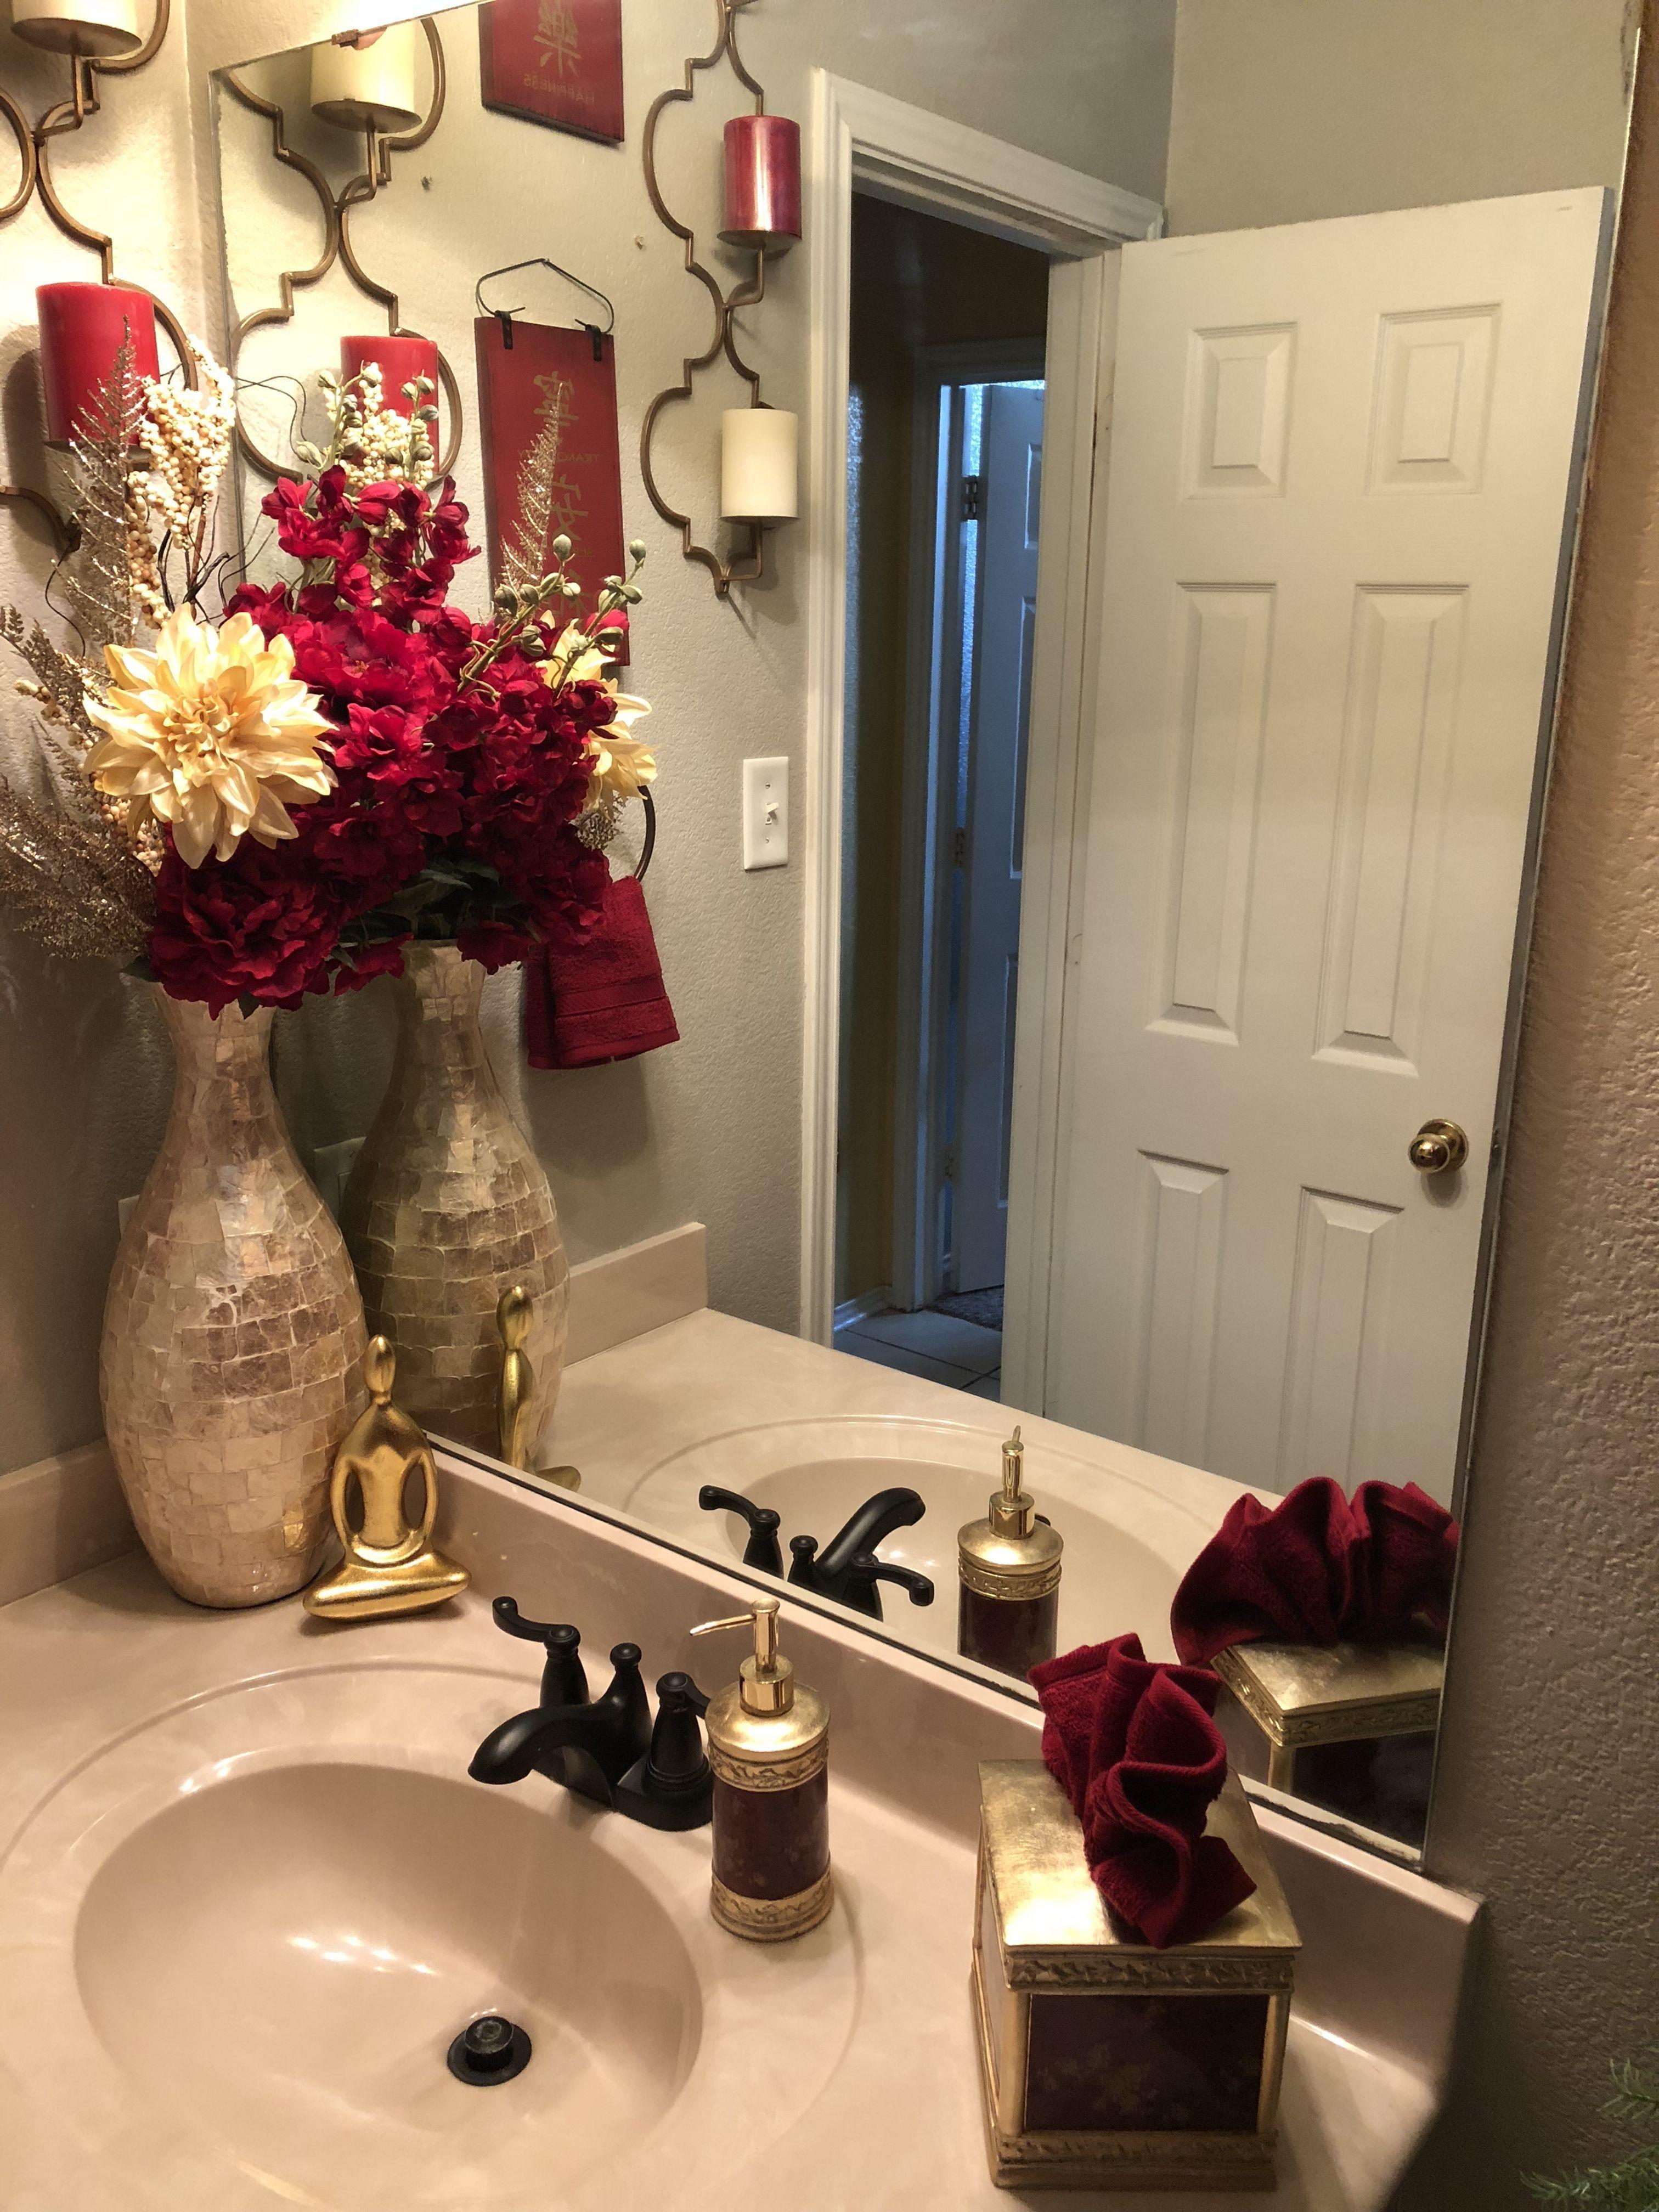 50 Amazing Christmas Bathroom Decorations That Will Amaze You Teracee Red Bathroom Decor Christmas Bathroom Decor Restroom Decor